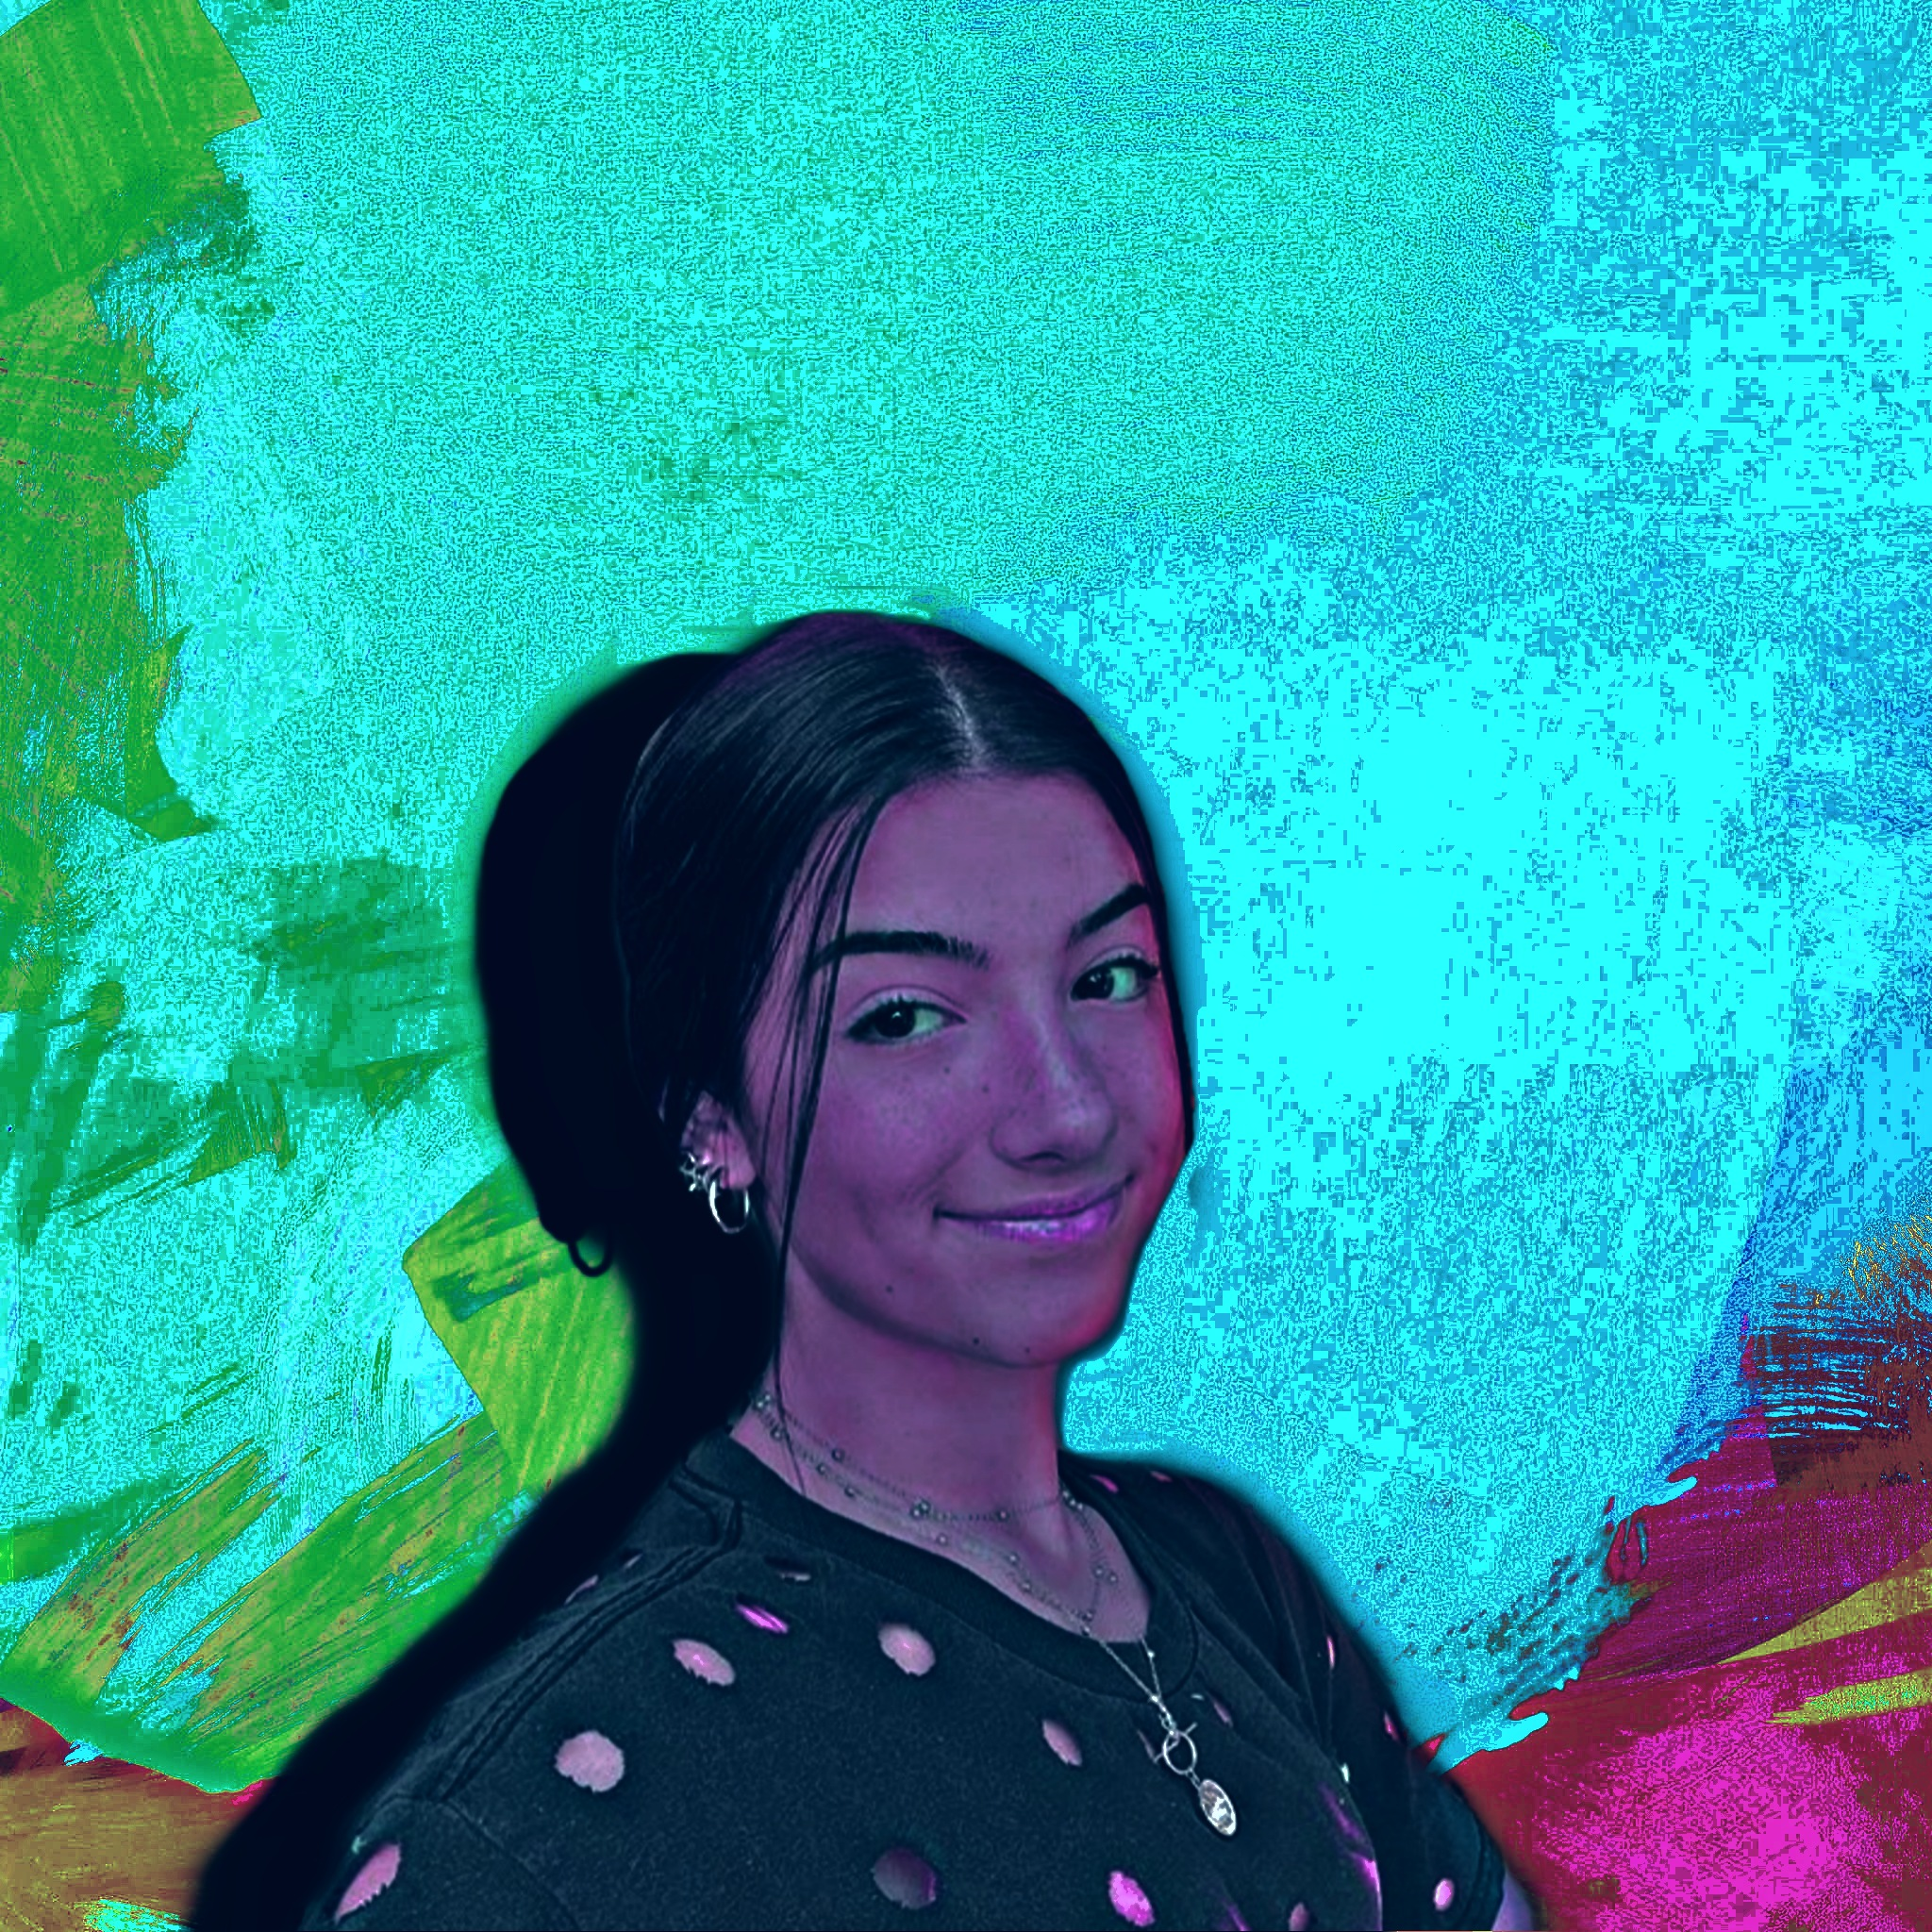 A happy girl illustration